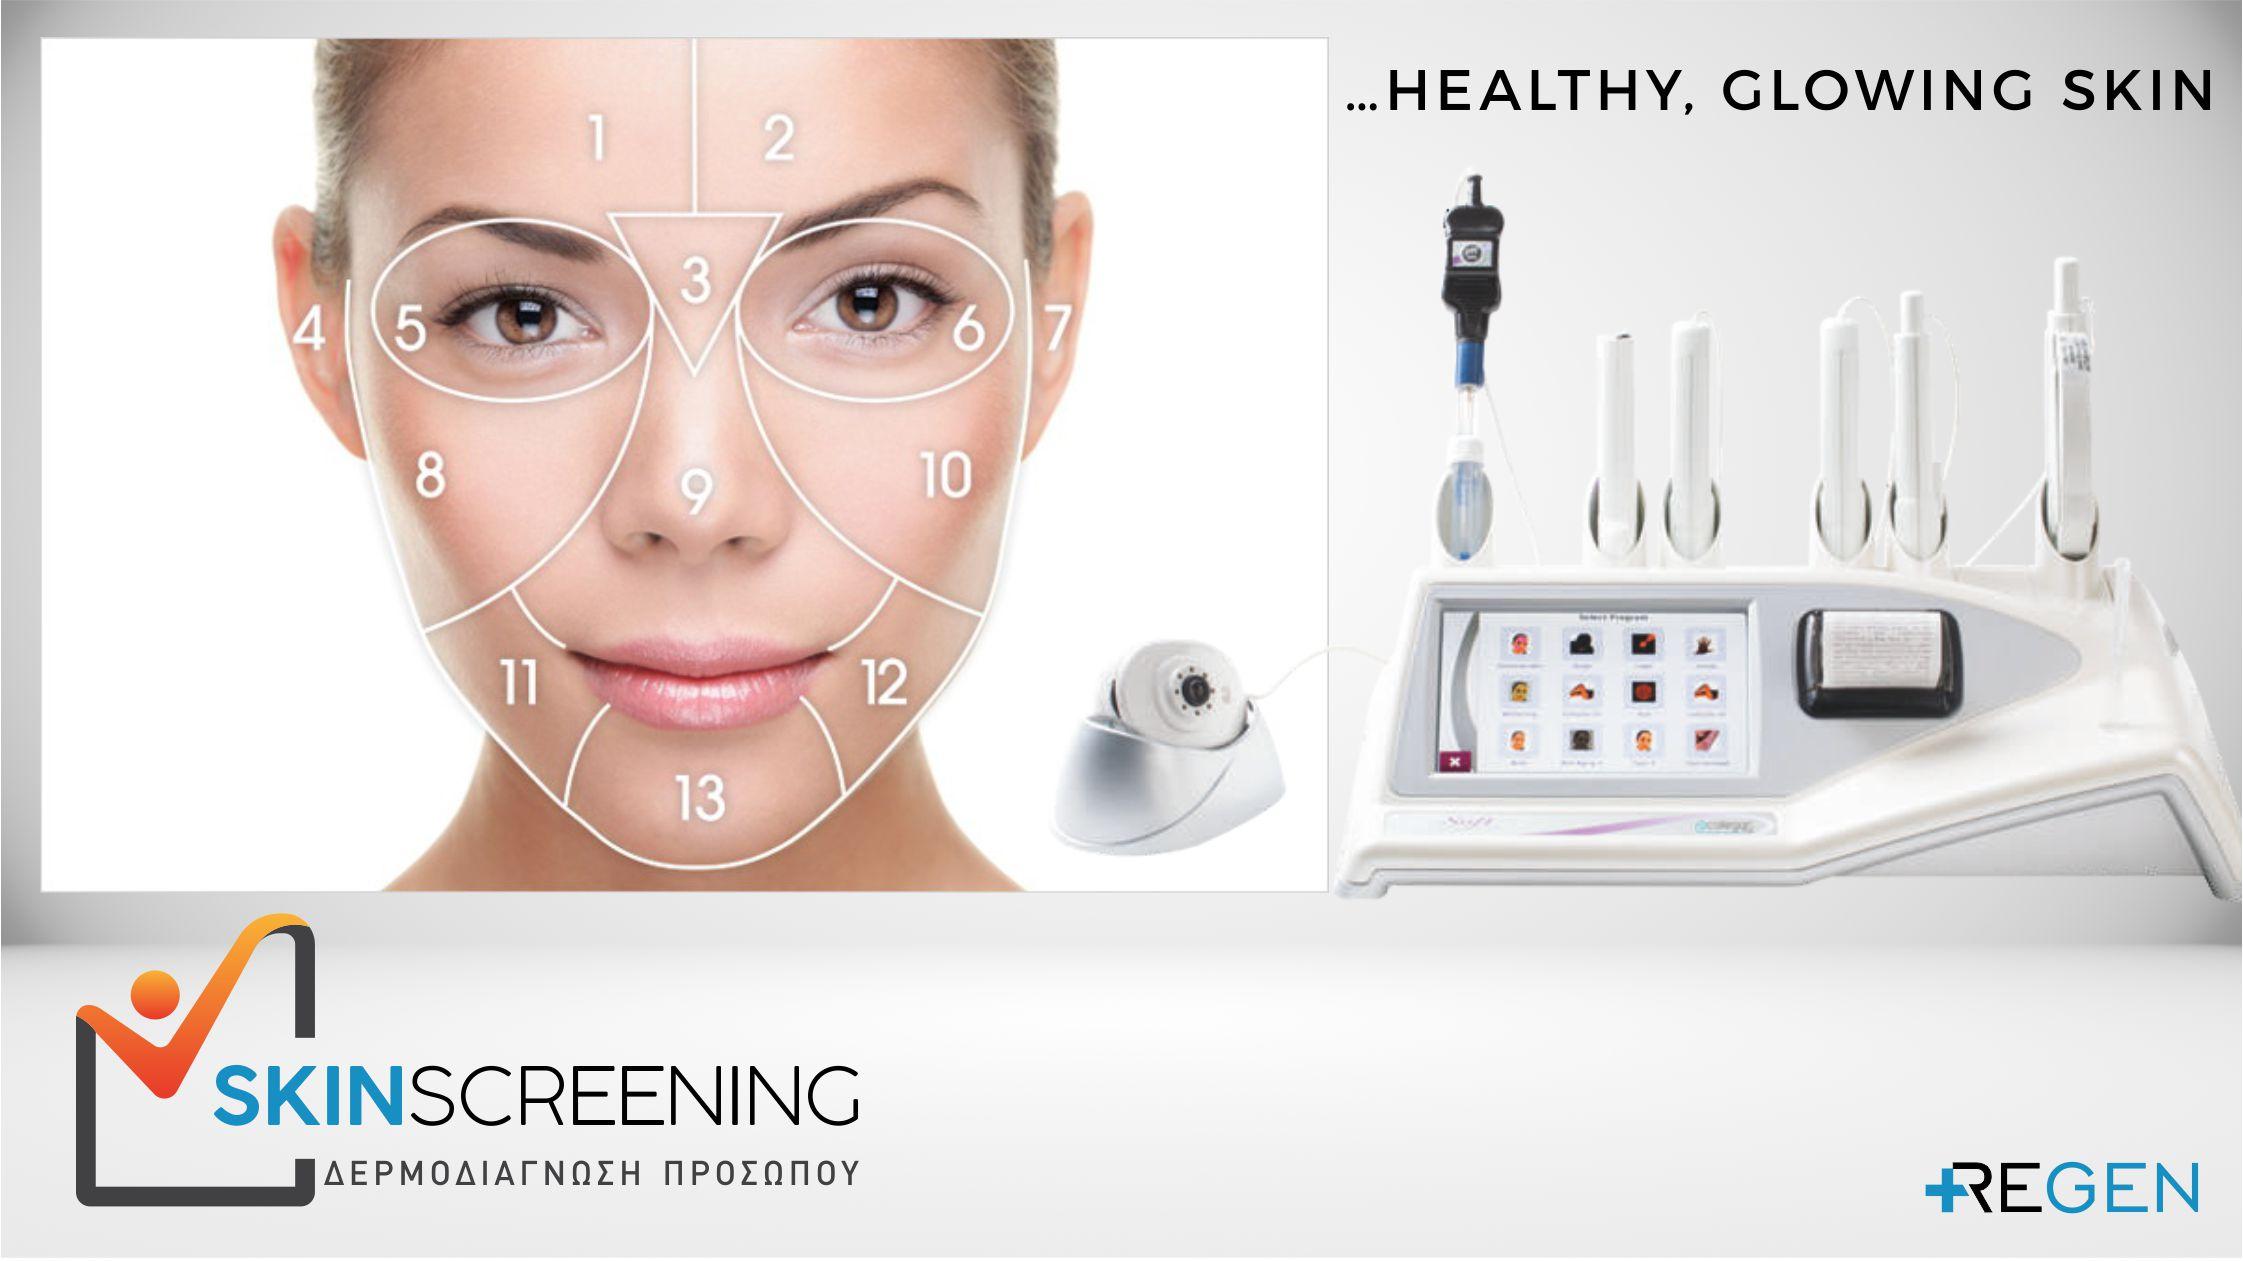 Skin Screening card11